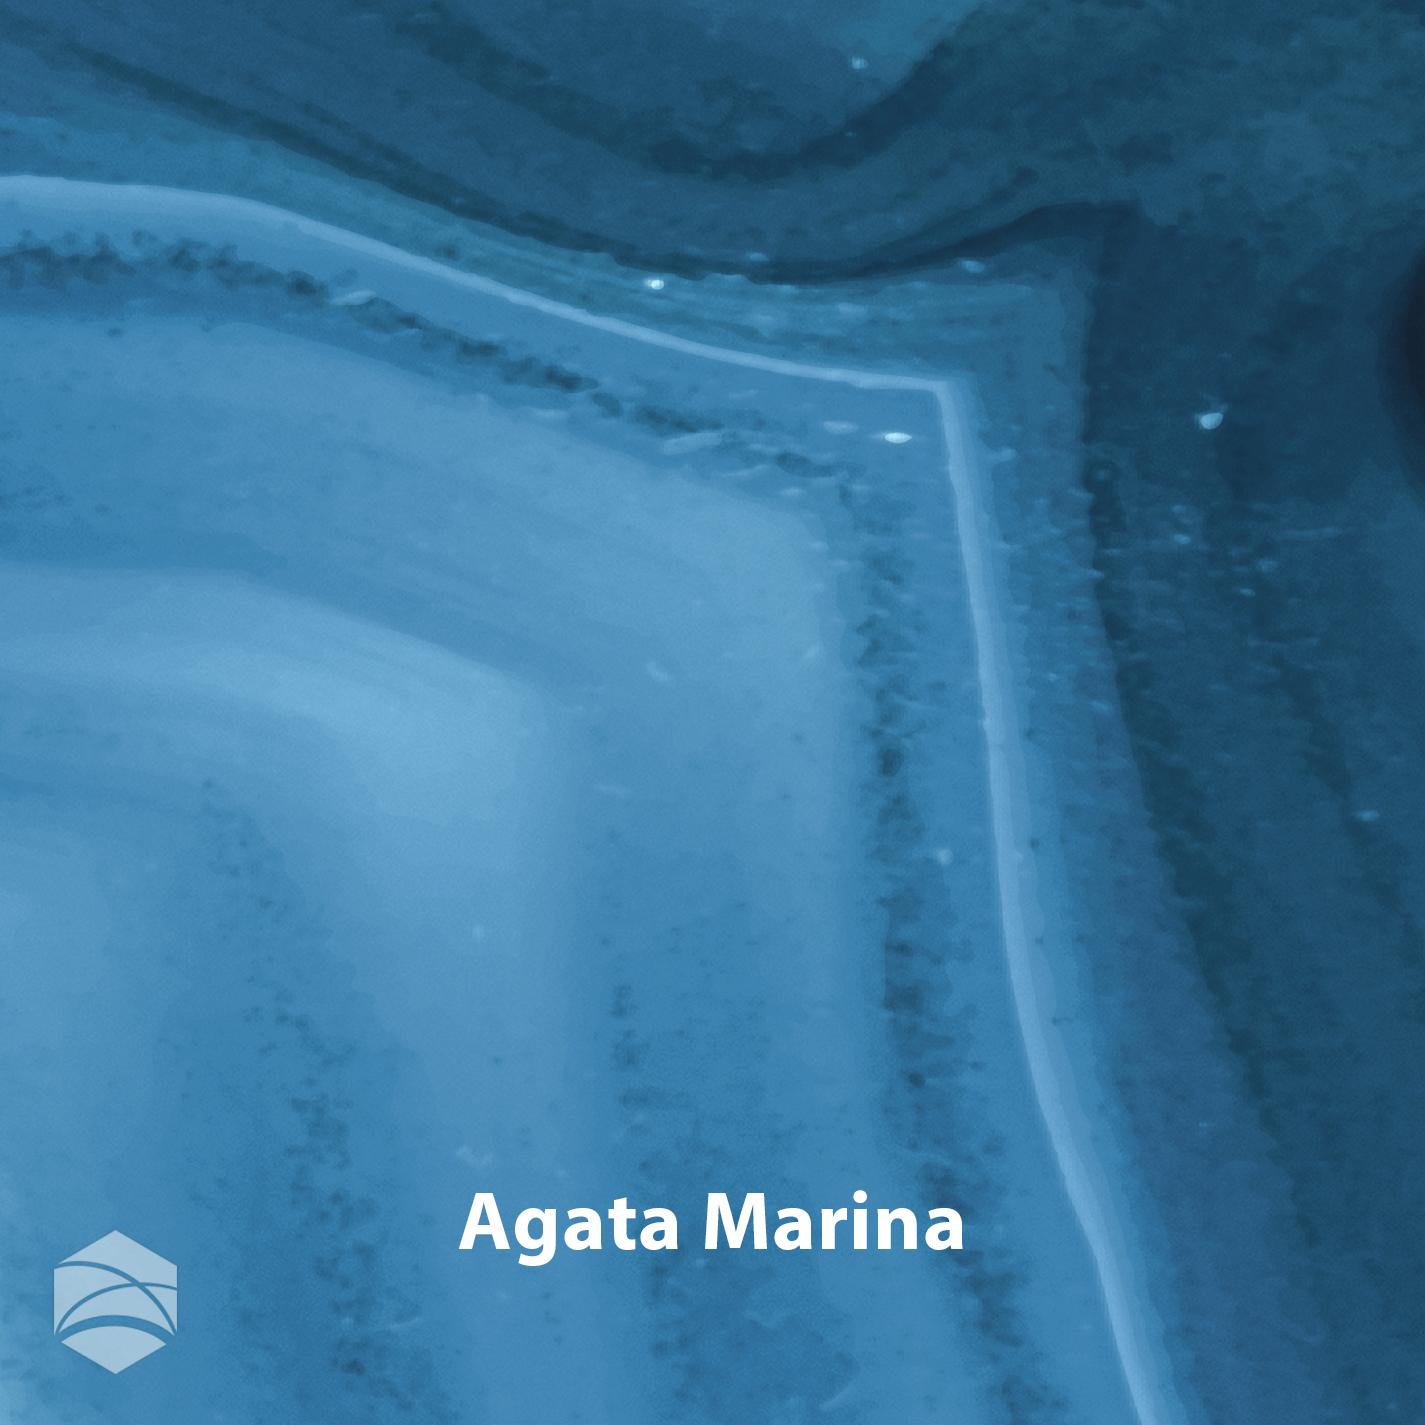 Agata Marina_V2_14x14.jpg